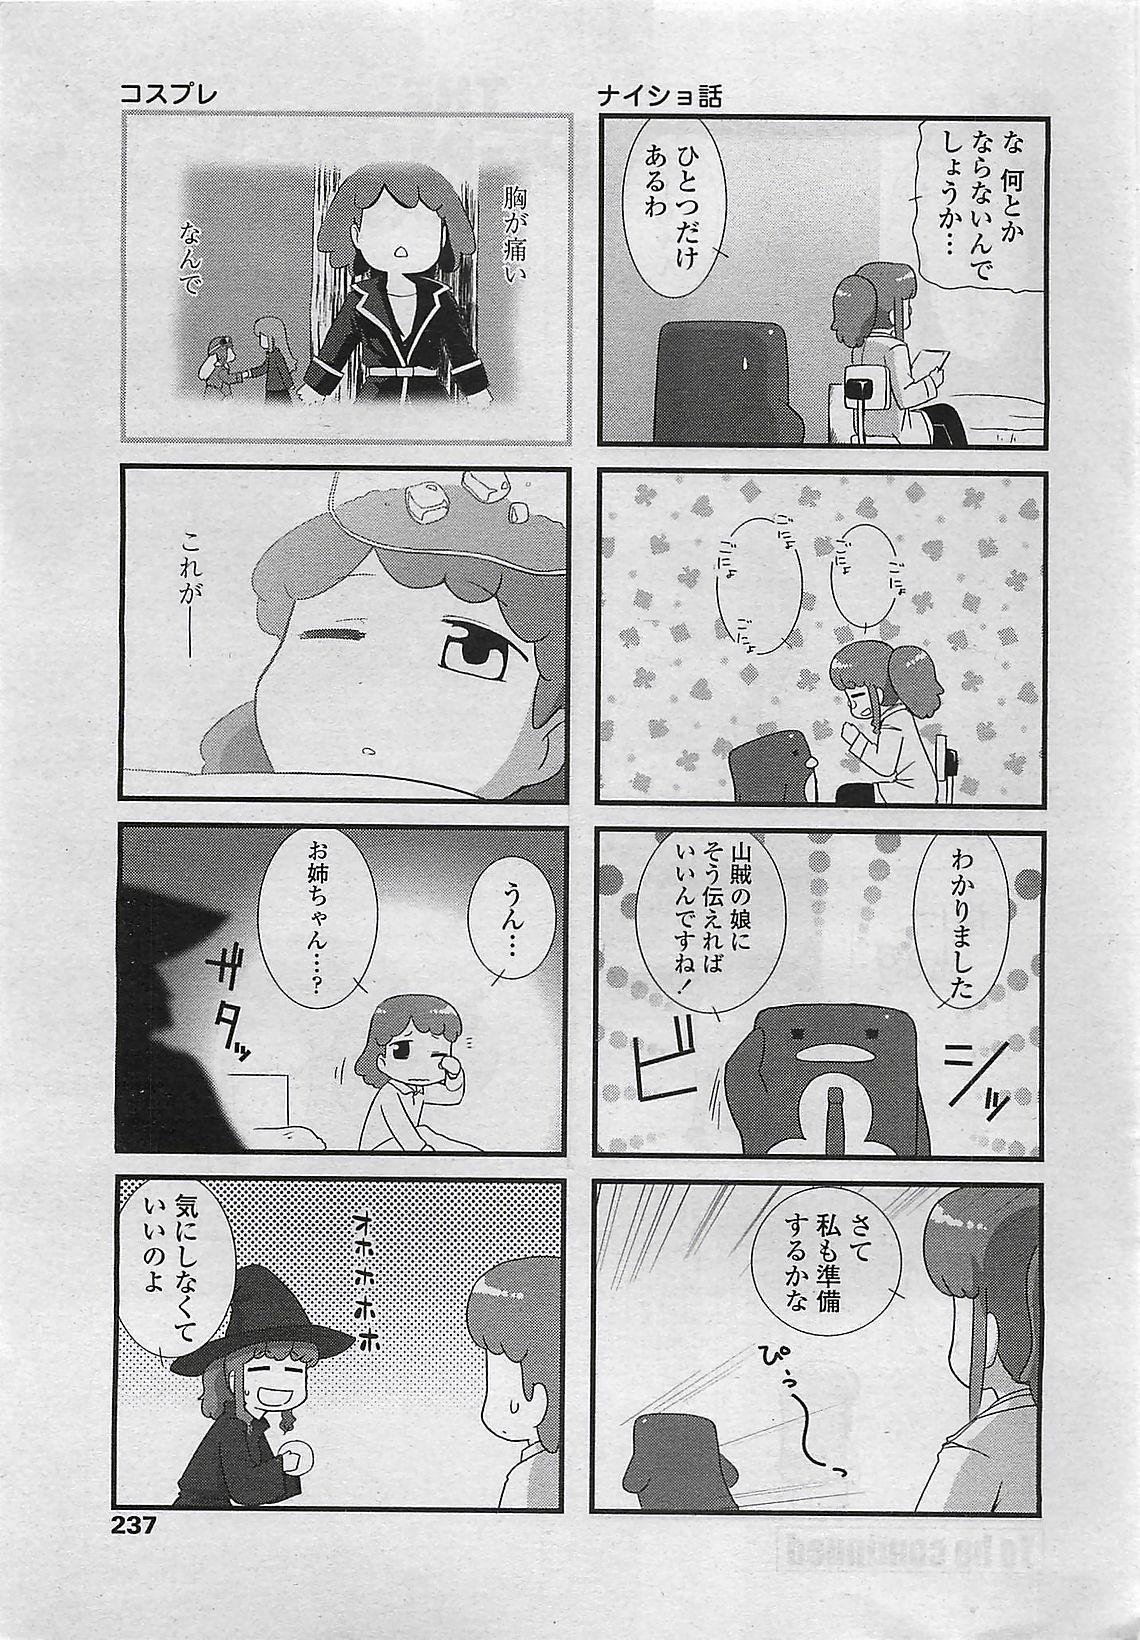 COMIC Penguin Club Sanzokuban 2007-03 238